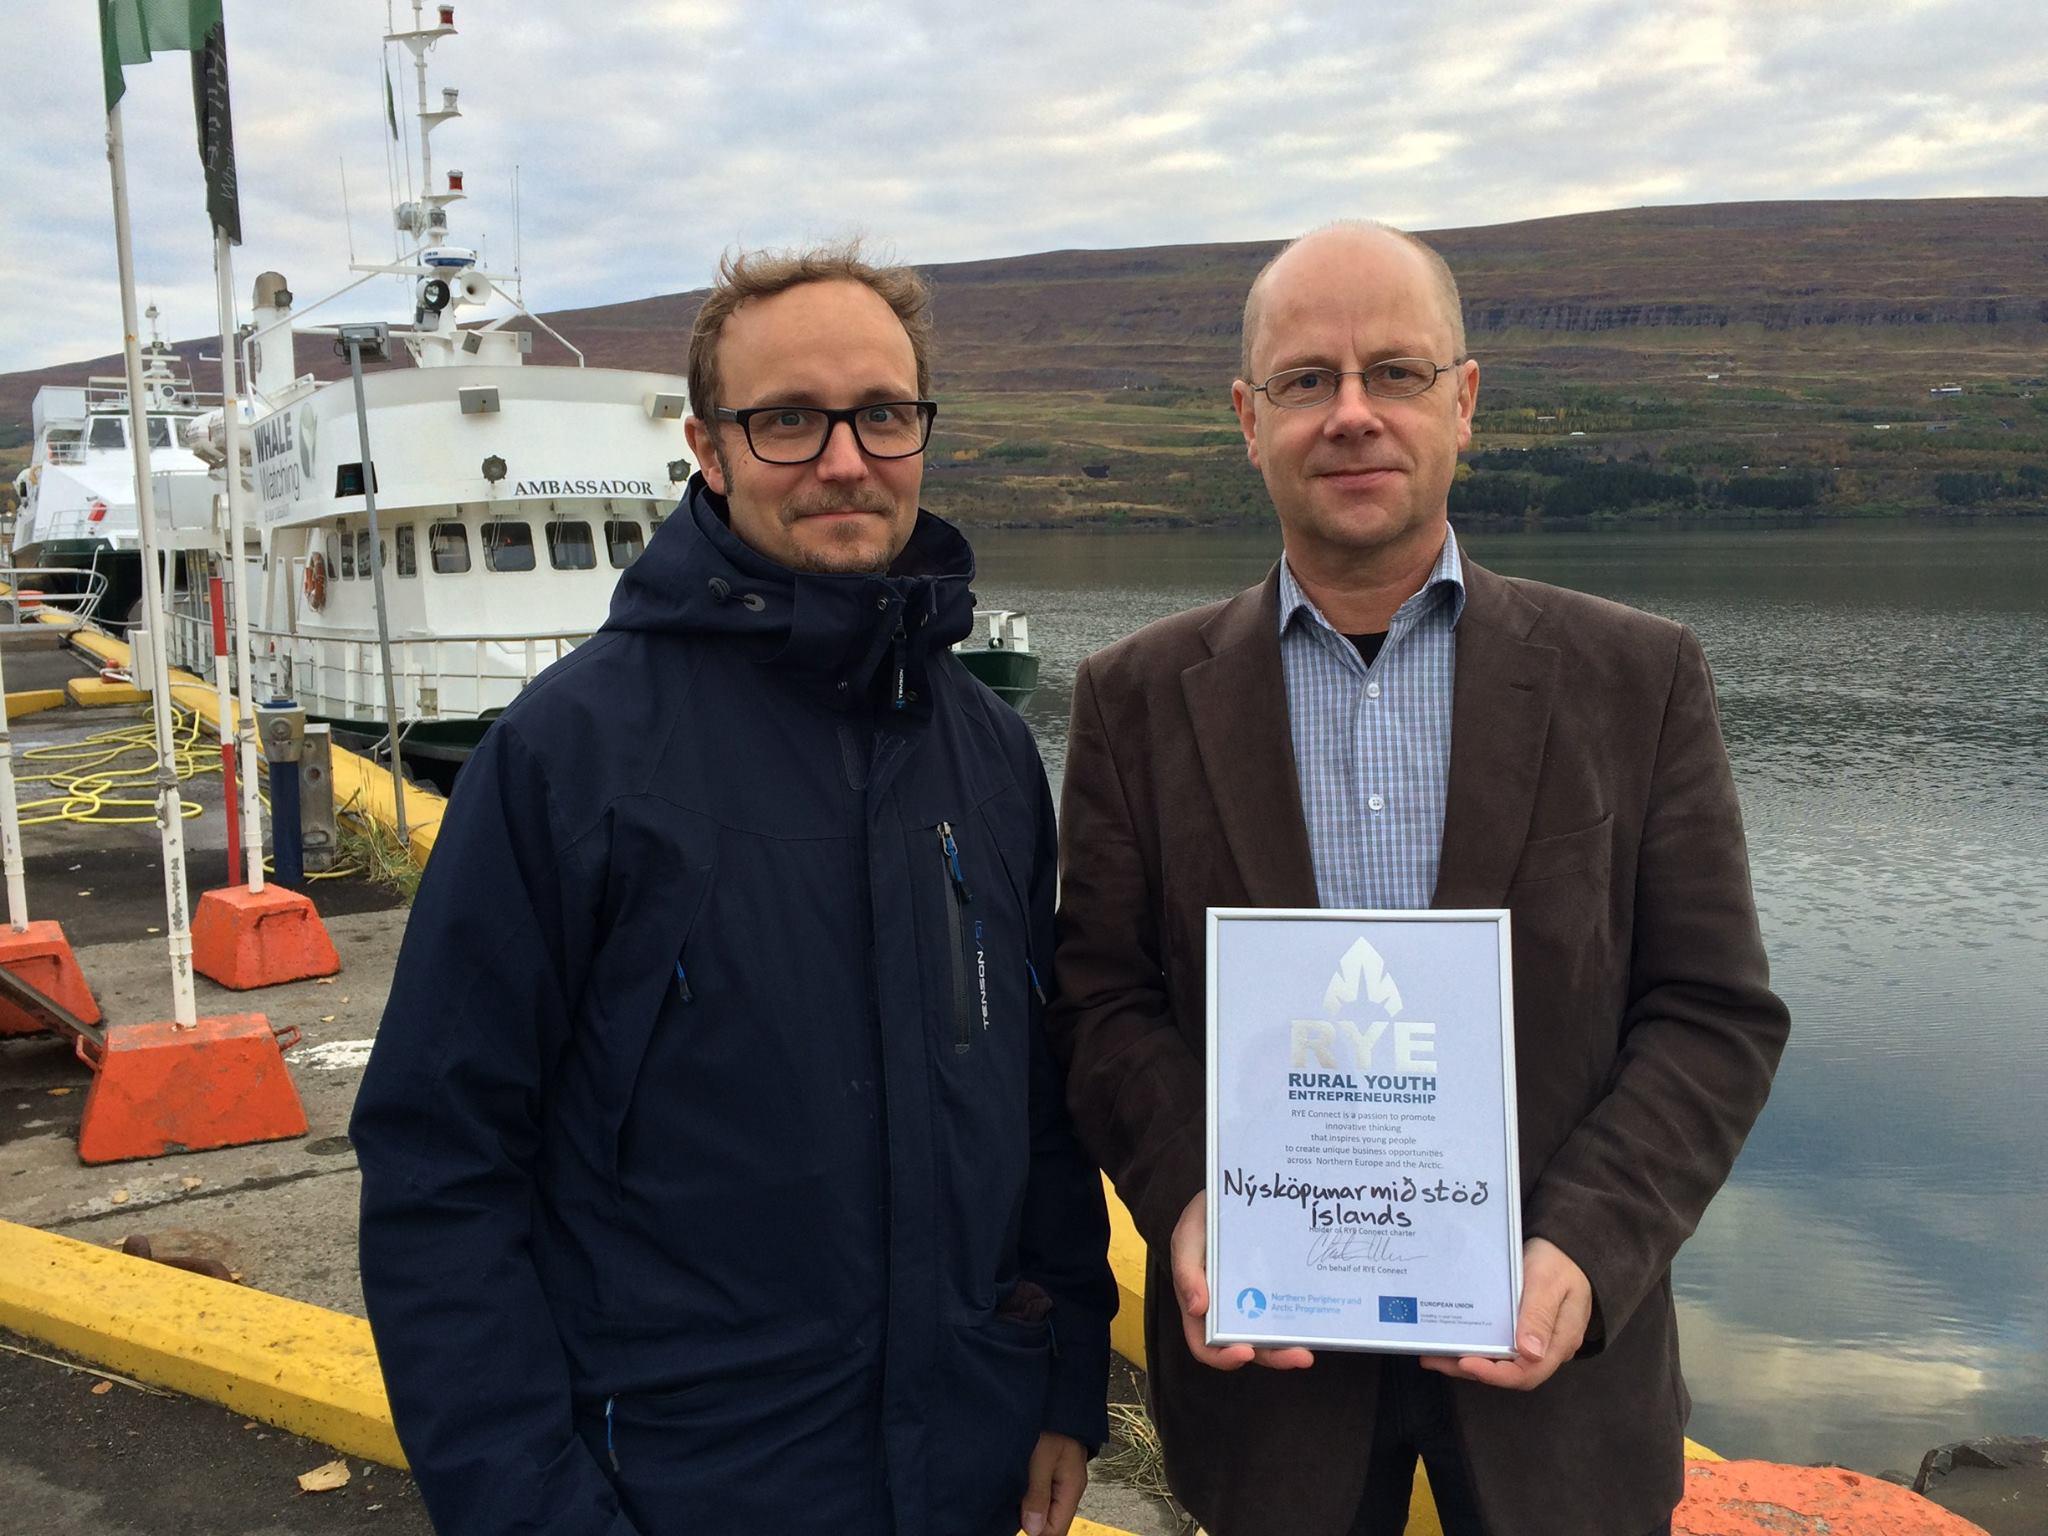 Delivering RYE Charter to Eyjolfur Eyjolfsson from Innovation Center Iceland